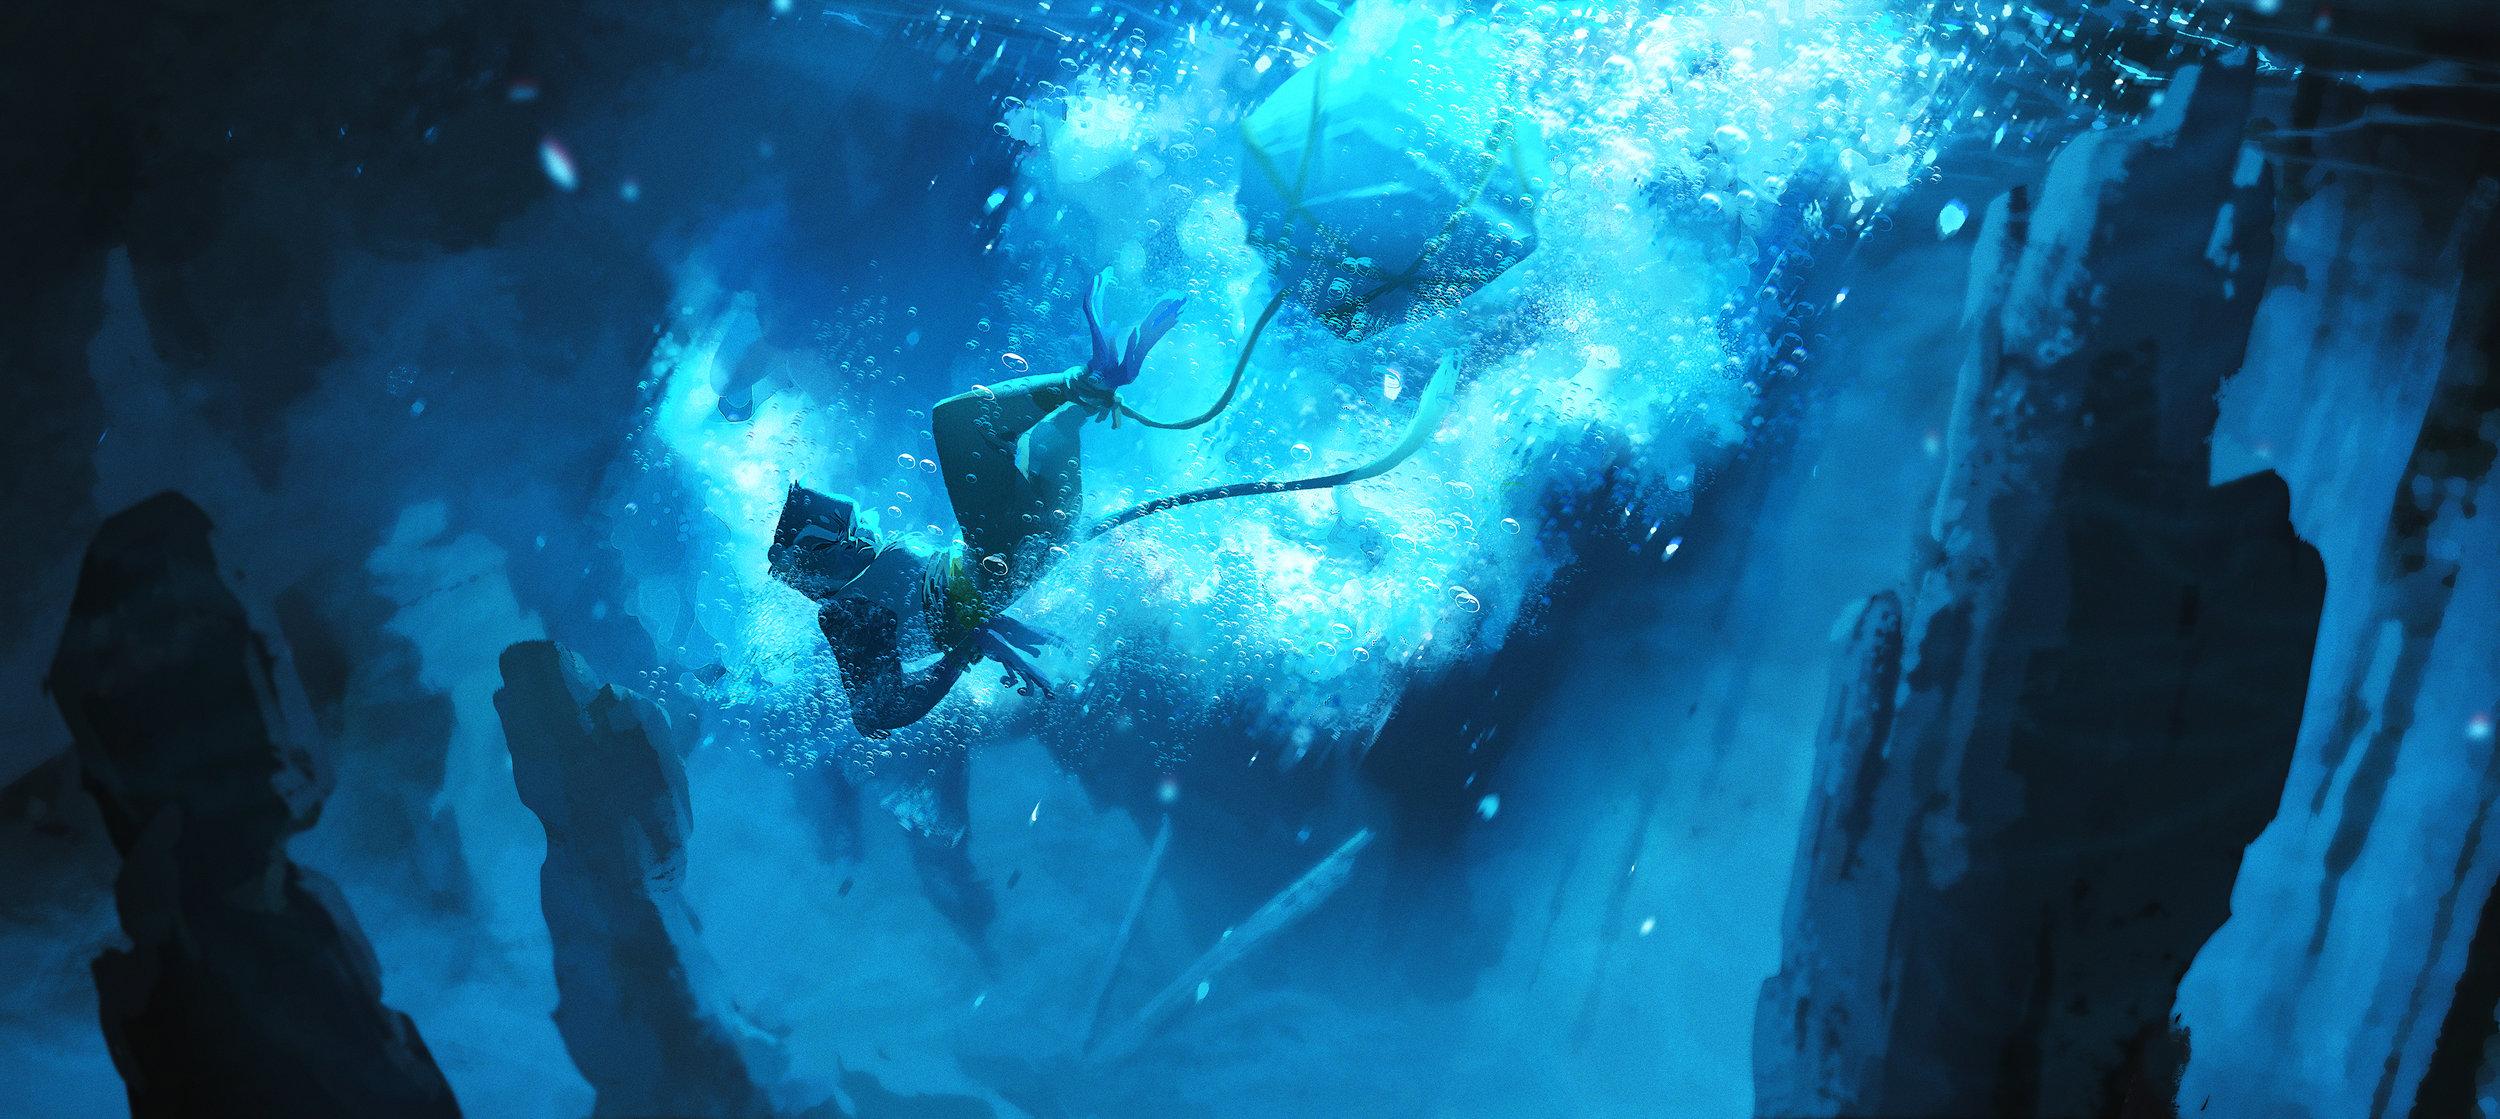 Drowning_02 copy.jpg